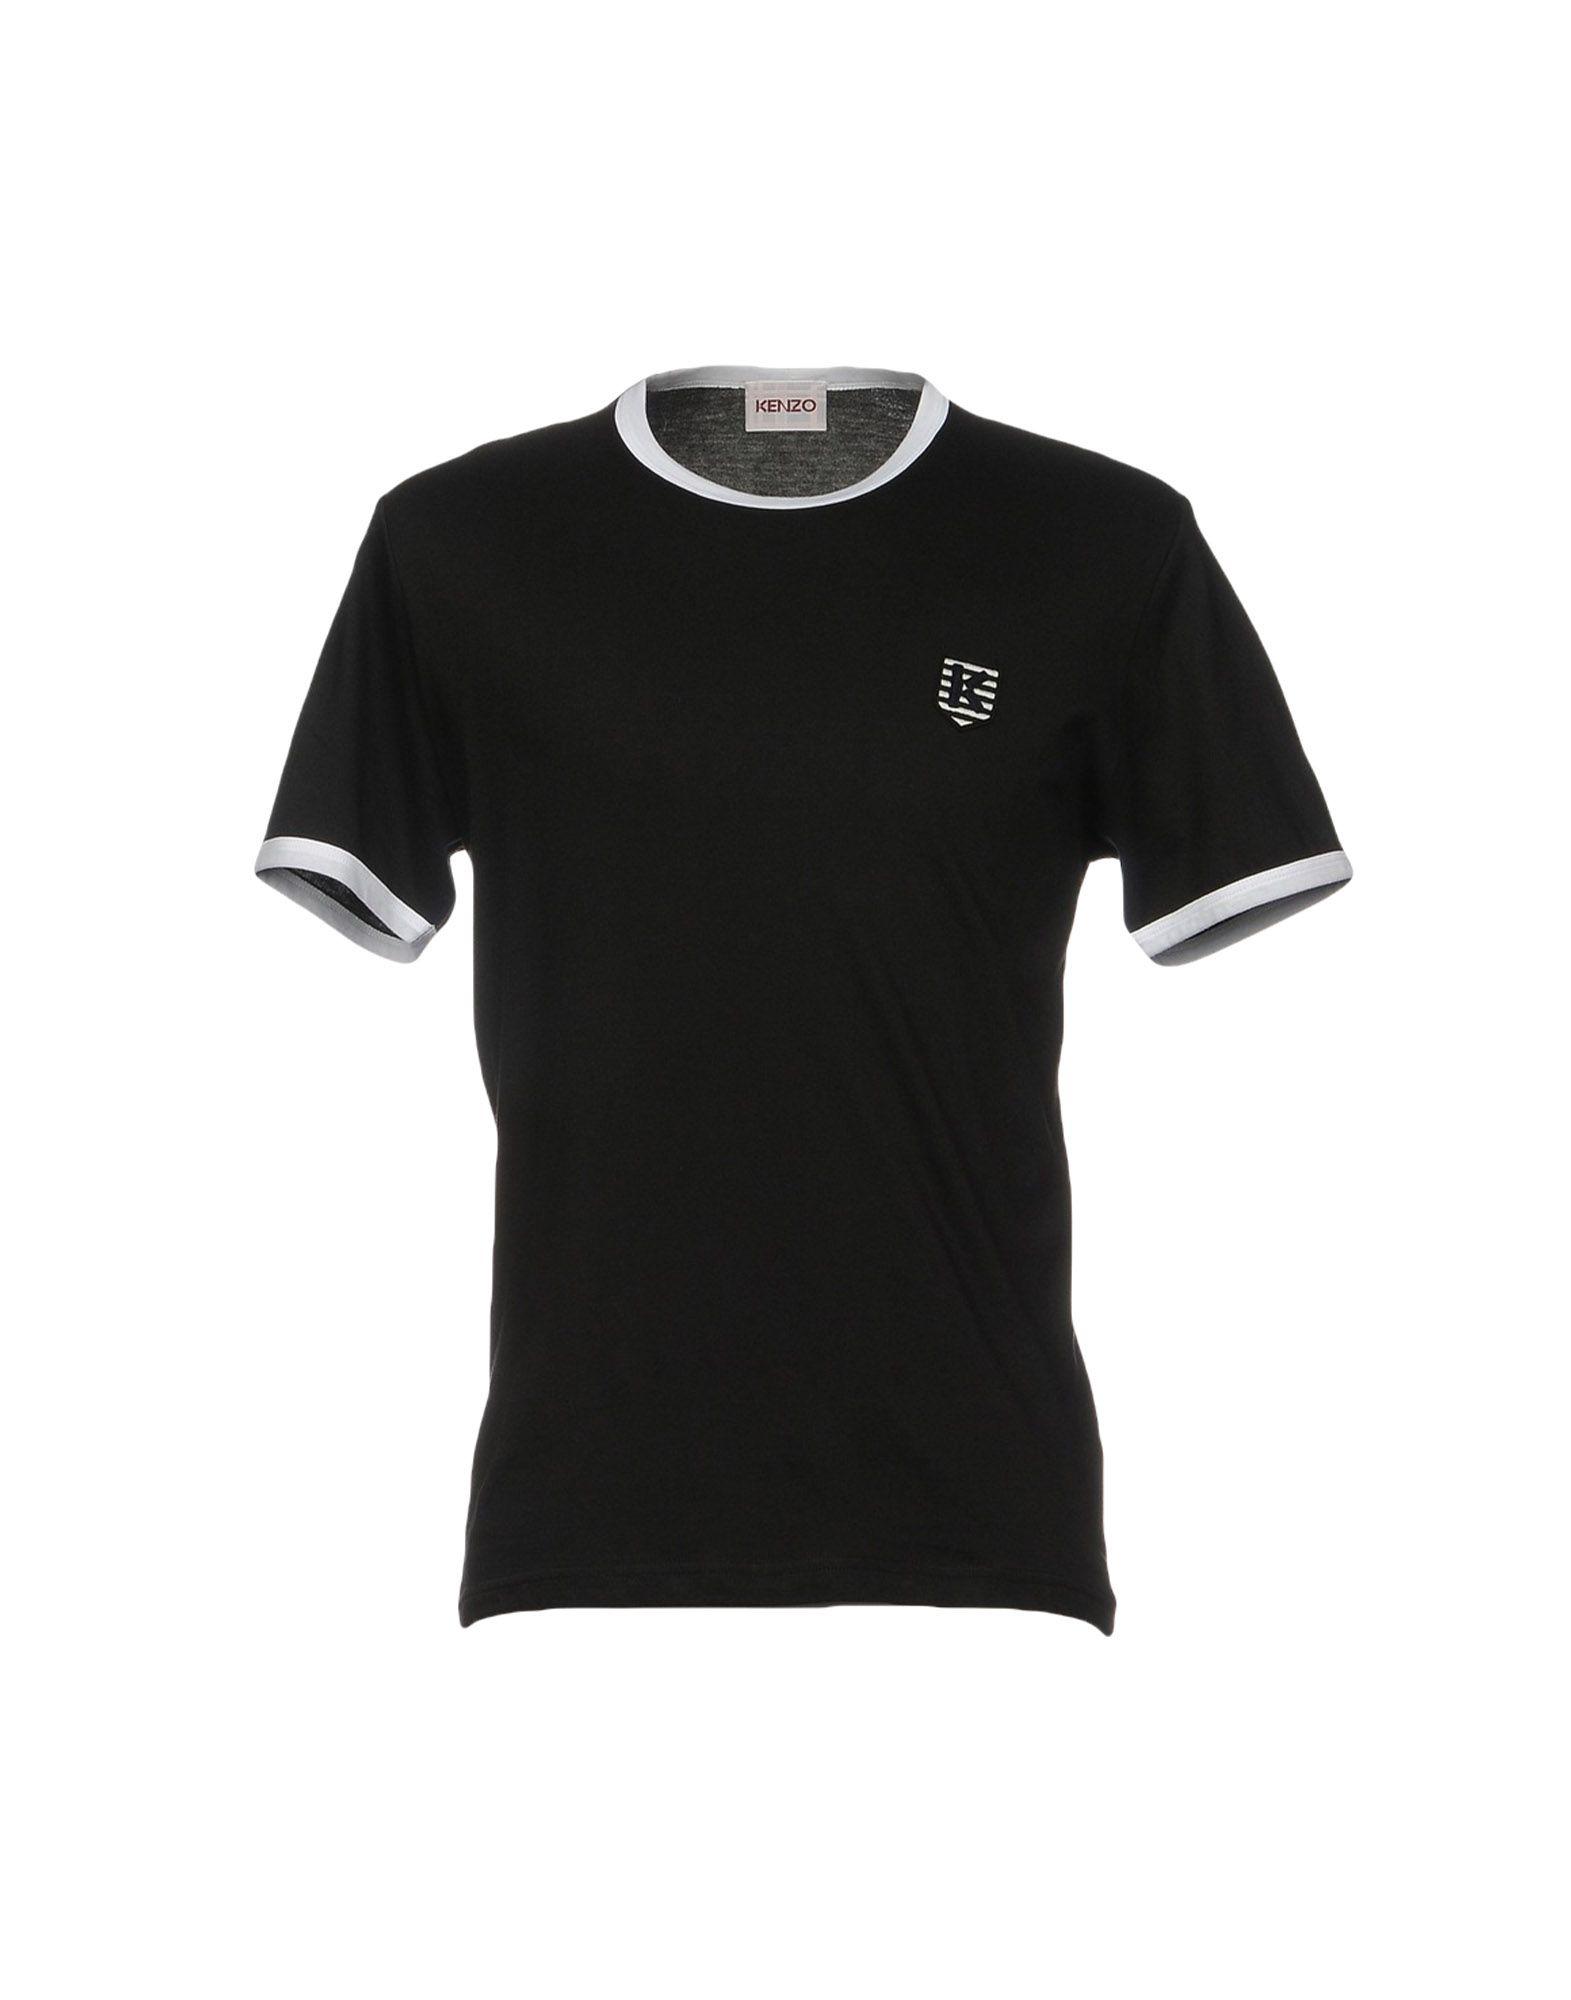 T-Shirt Kenzo Uomo - Acquista online su